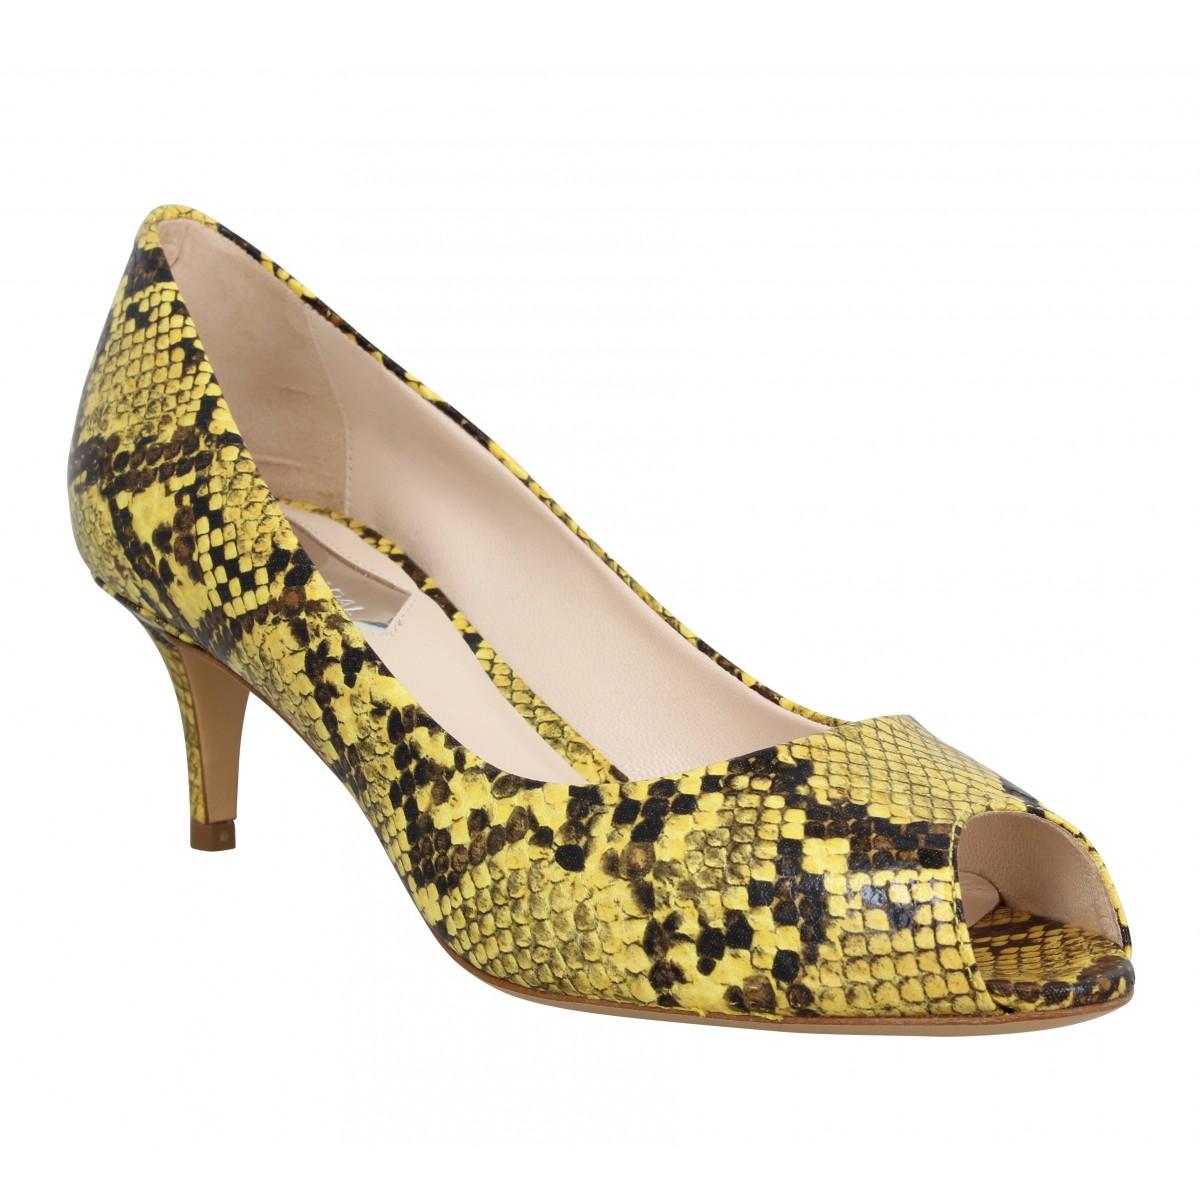 Sandales talons ATELIER MERCADAL 7020 python Femme Jaune